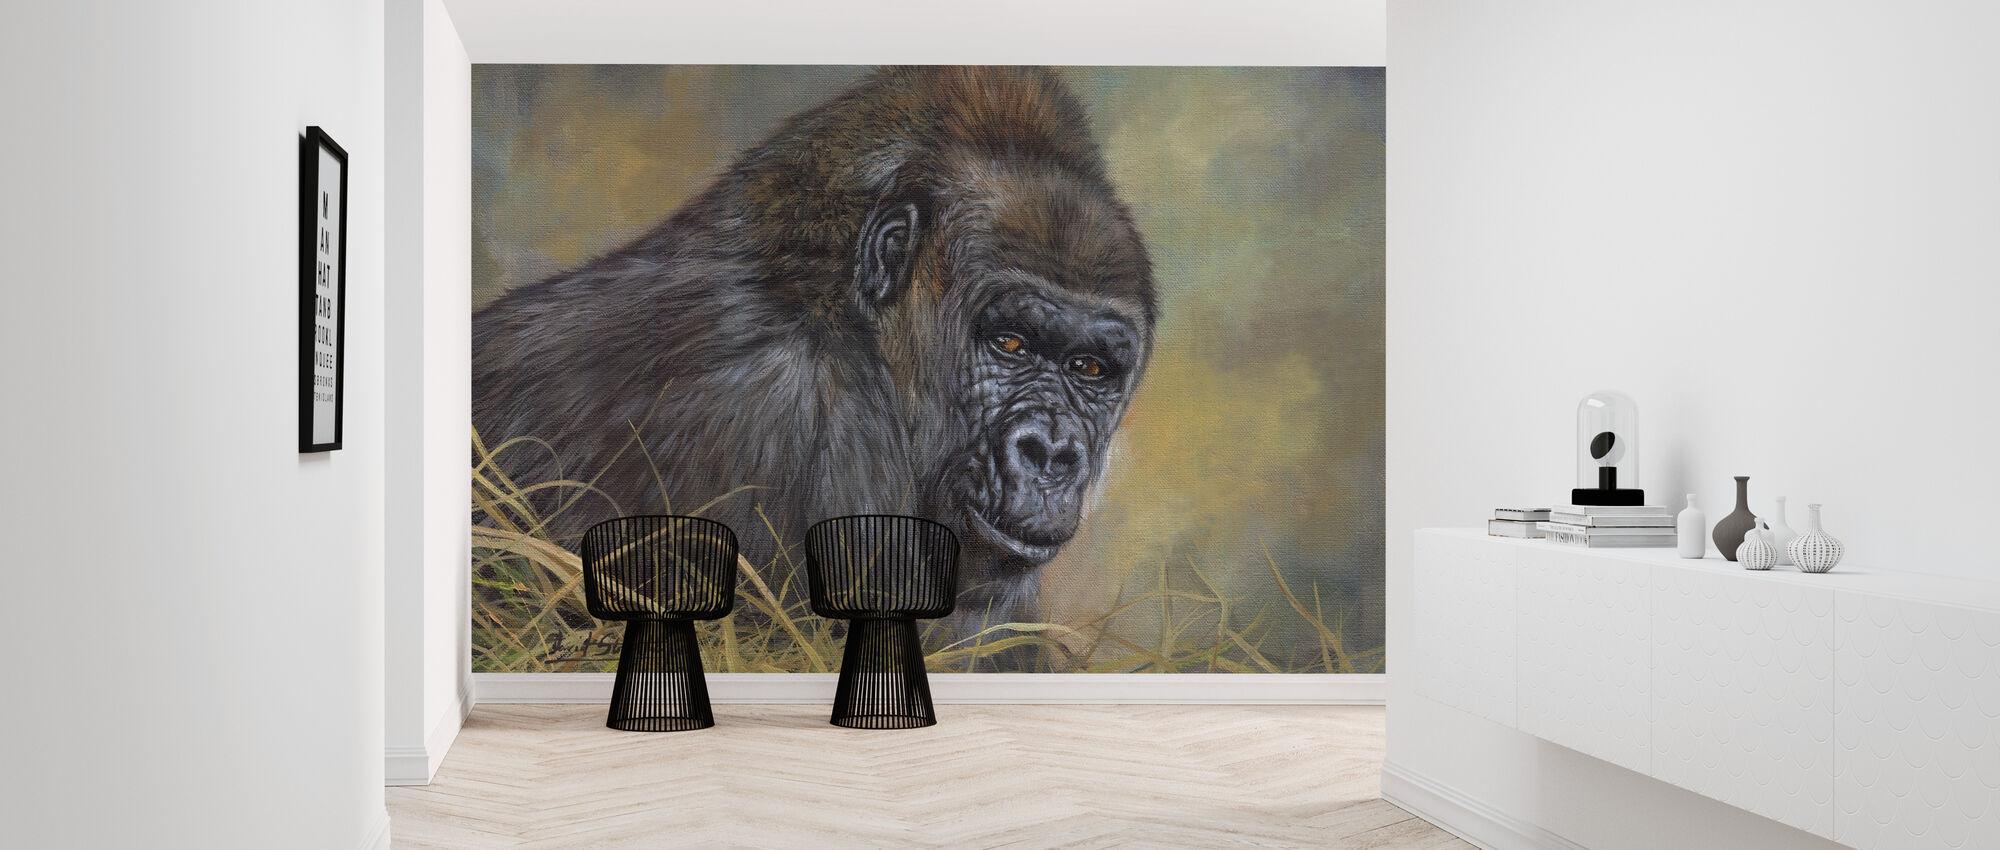 Gorilla - Wallpaper - Hallway